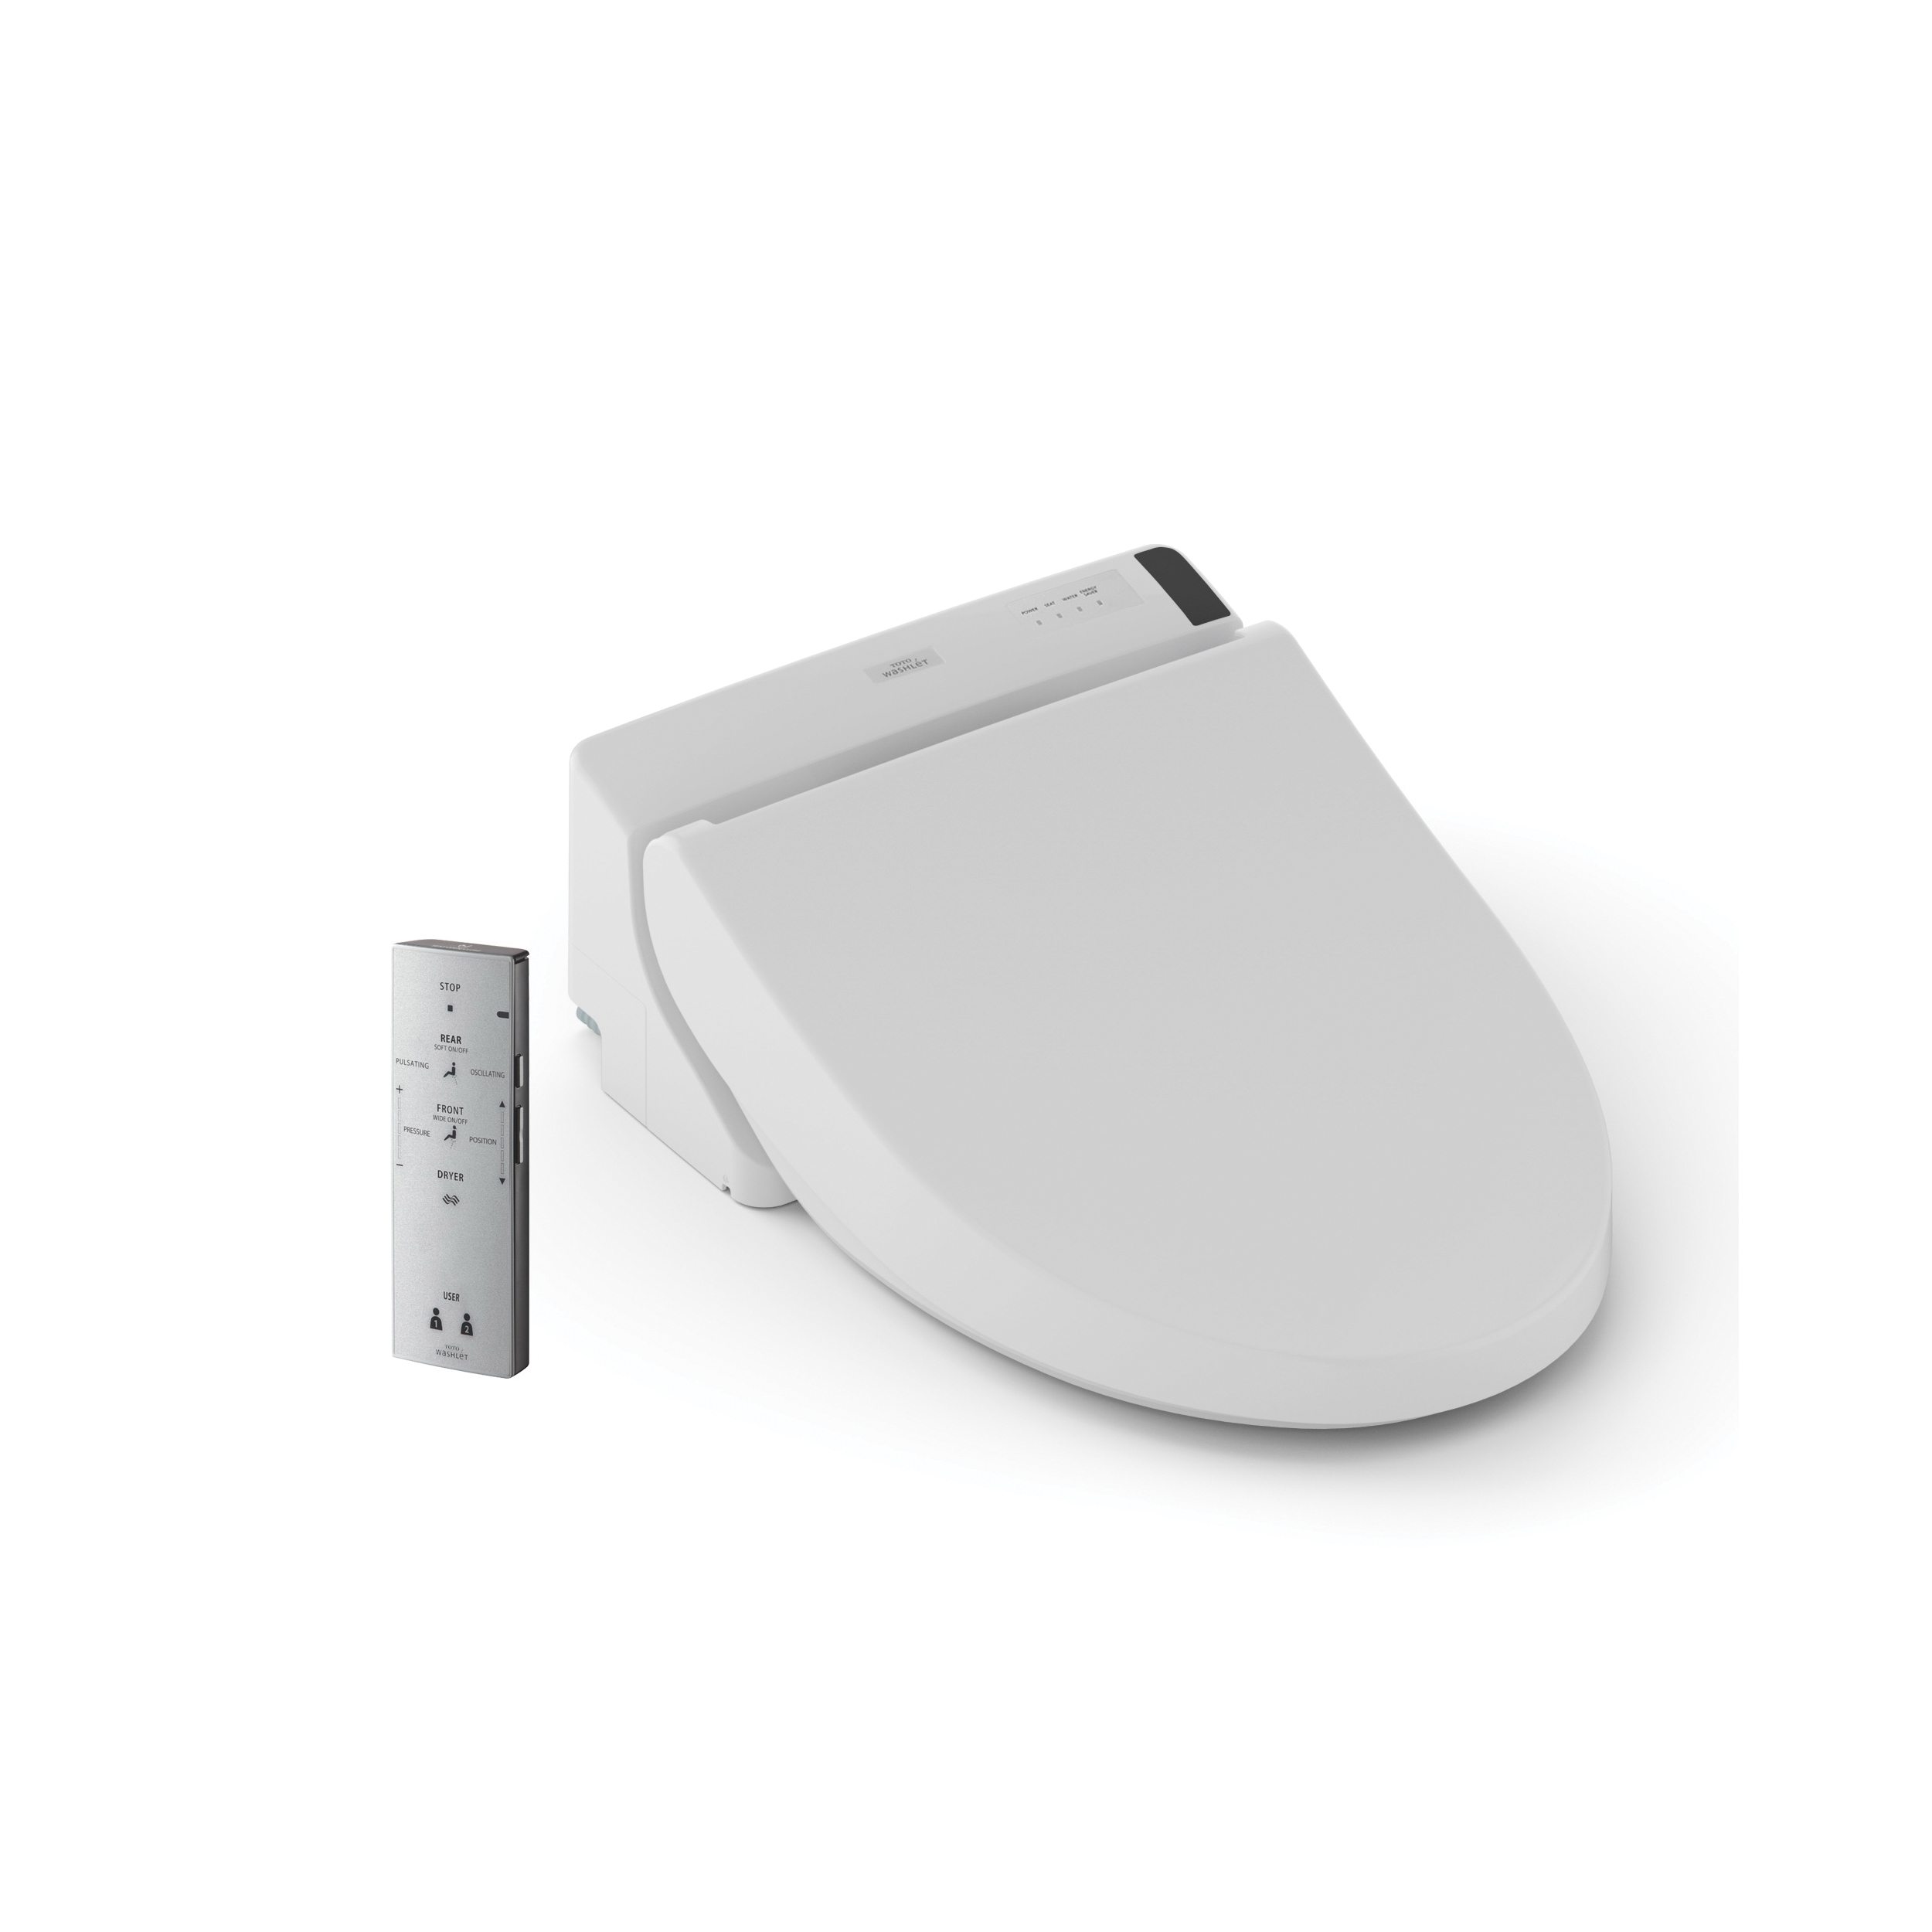 Toto® SW2043 Washlet® C200 Toilet Seat, Round Bowl, Closed Front, Plastic, Sedona Beige, Domestic